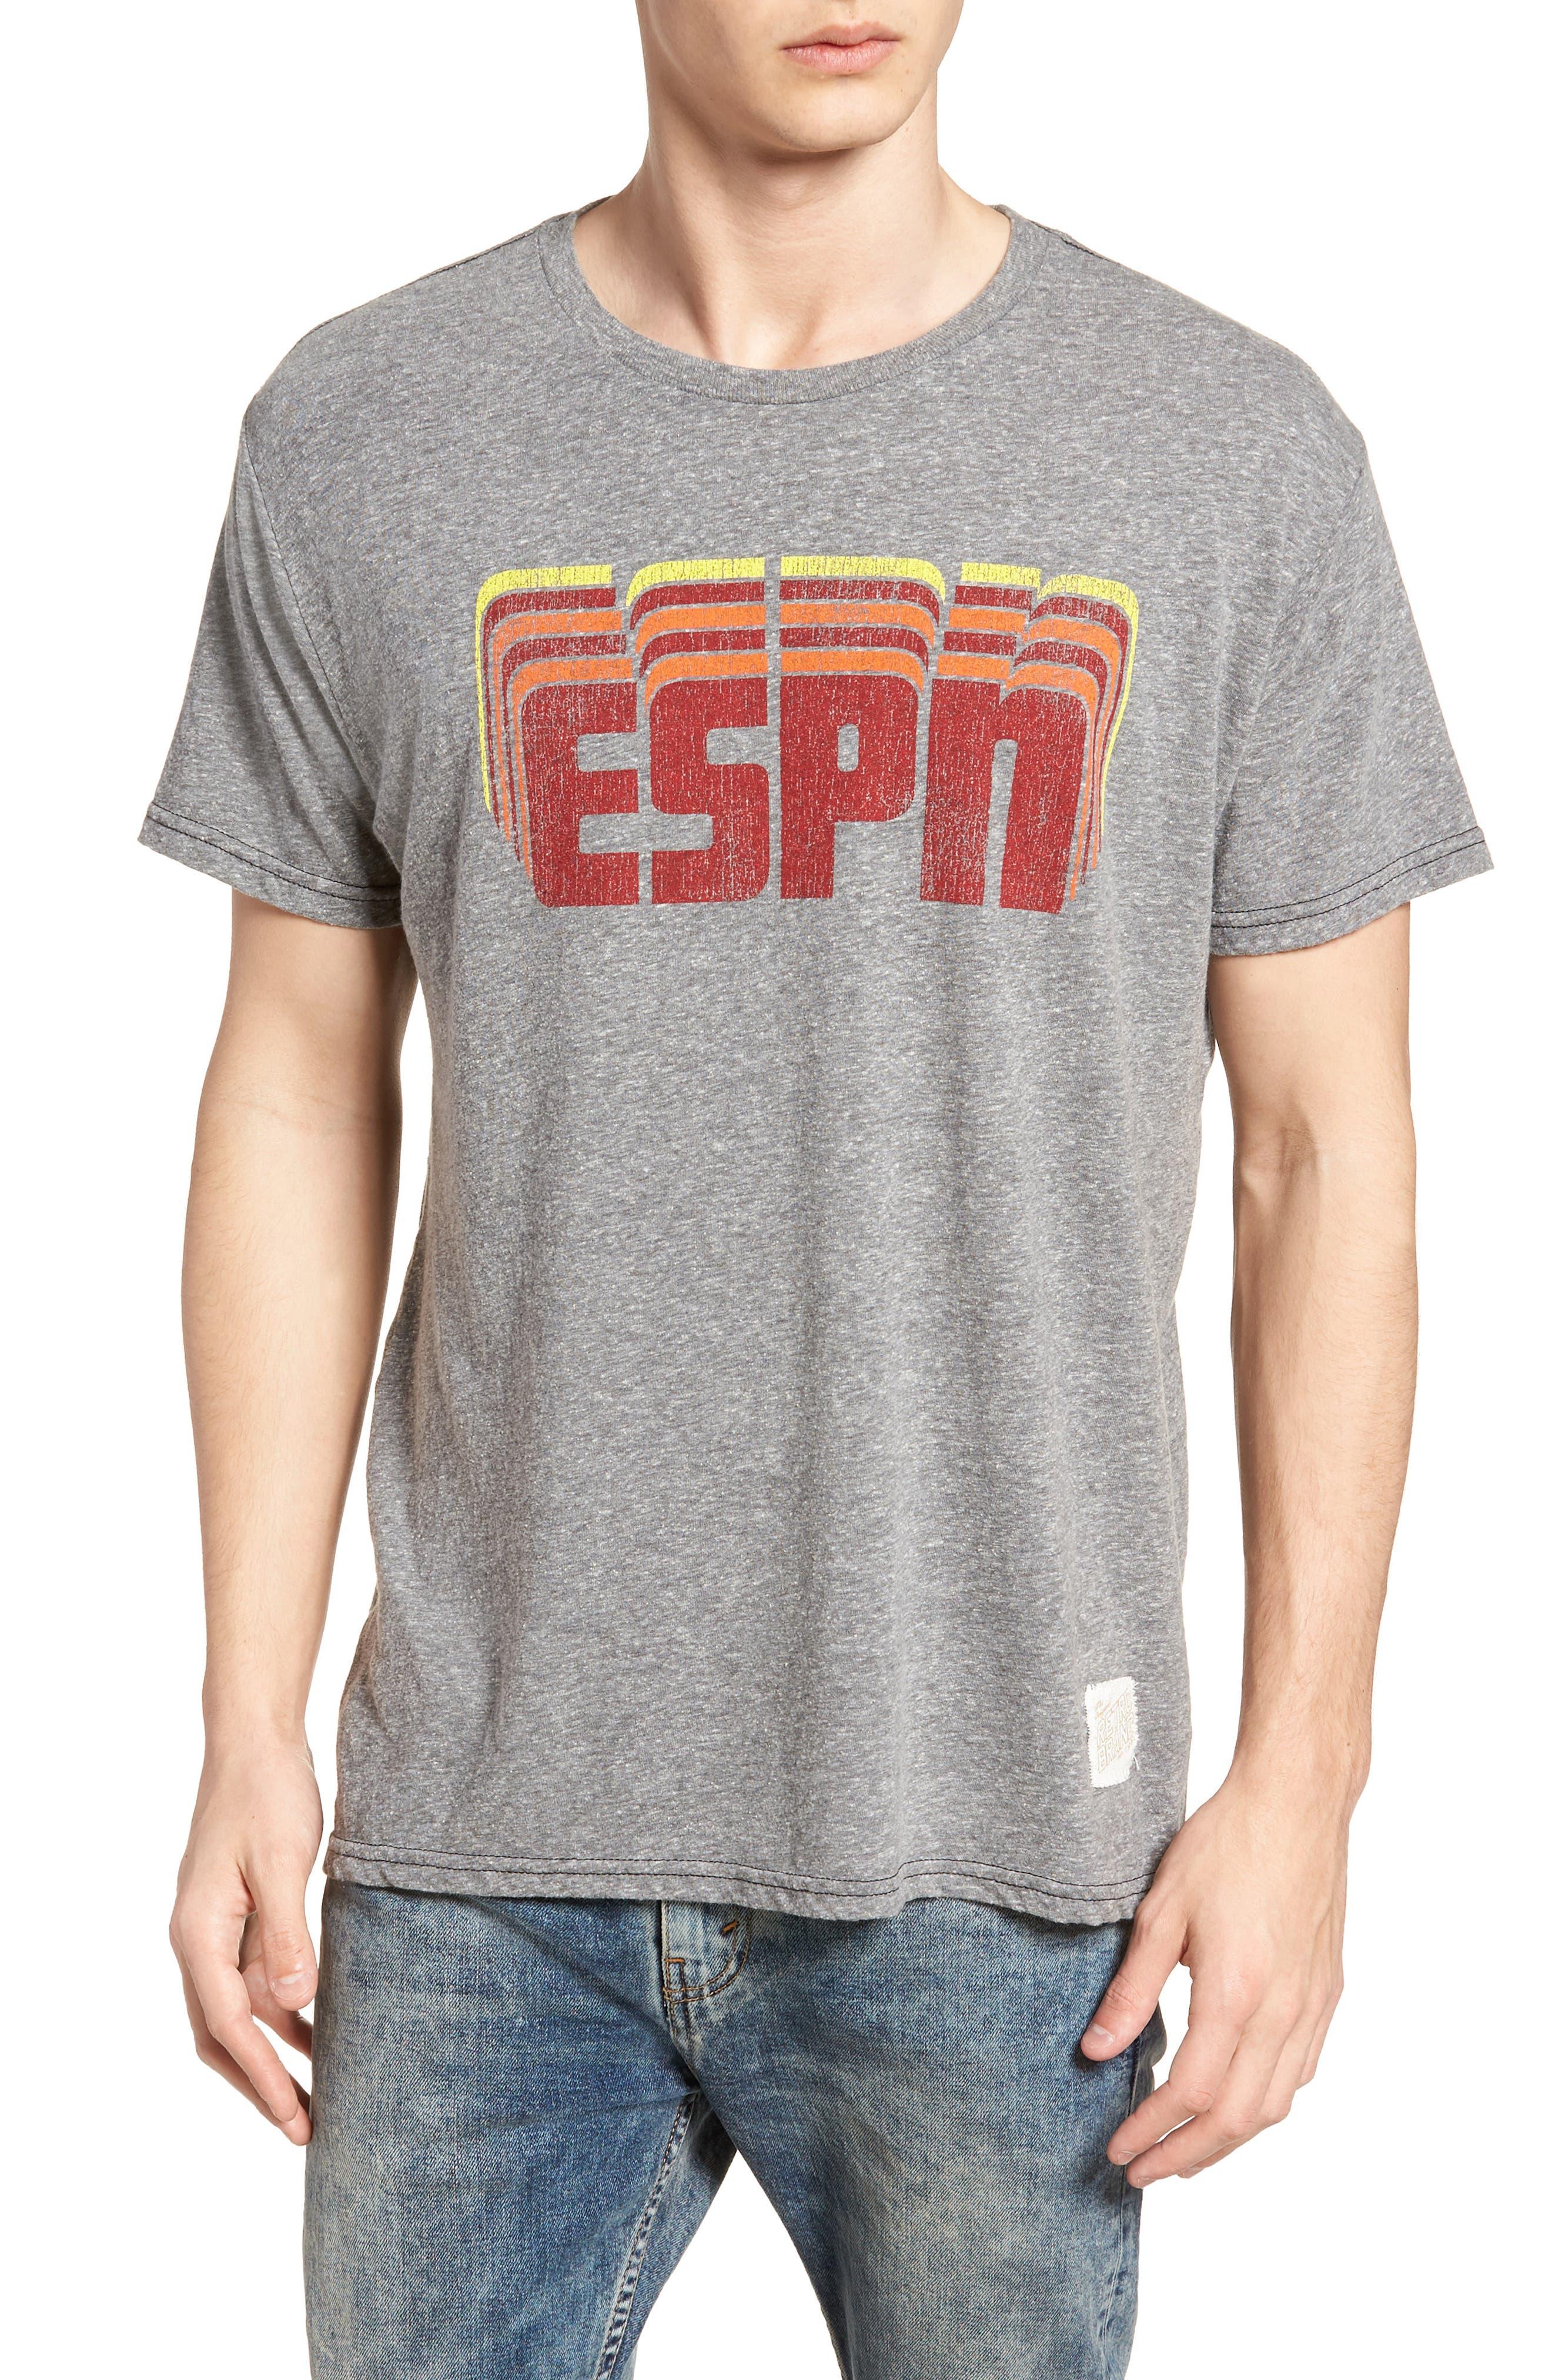 Main Image - Retro Brand ESPN Graphic T-Shirt